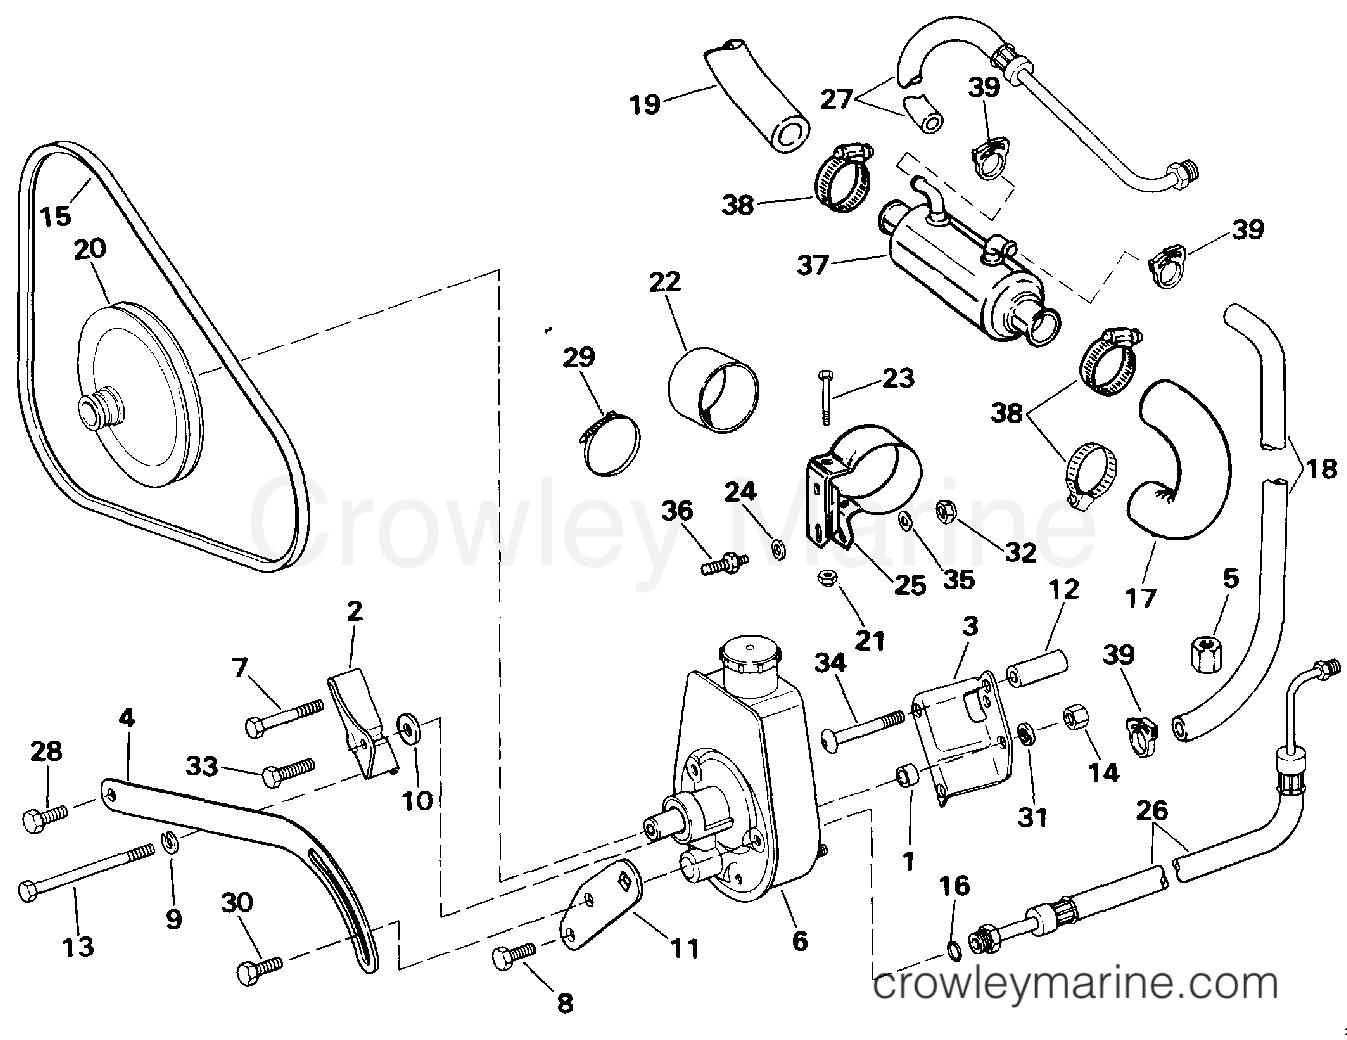 1994 OMC Stern Drive 5.8 - 58FBDPMDA - POWER STEERING PUMP